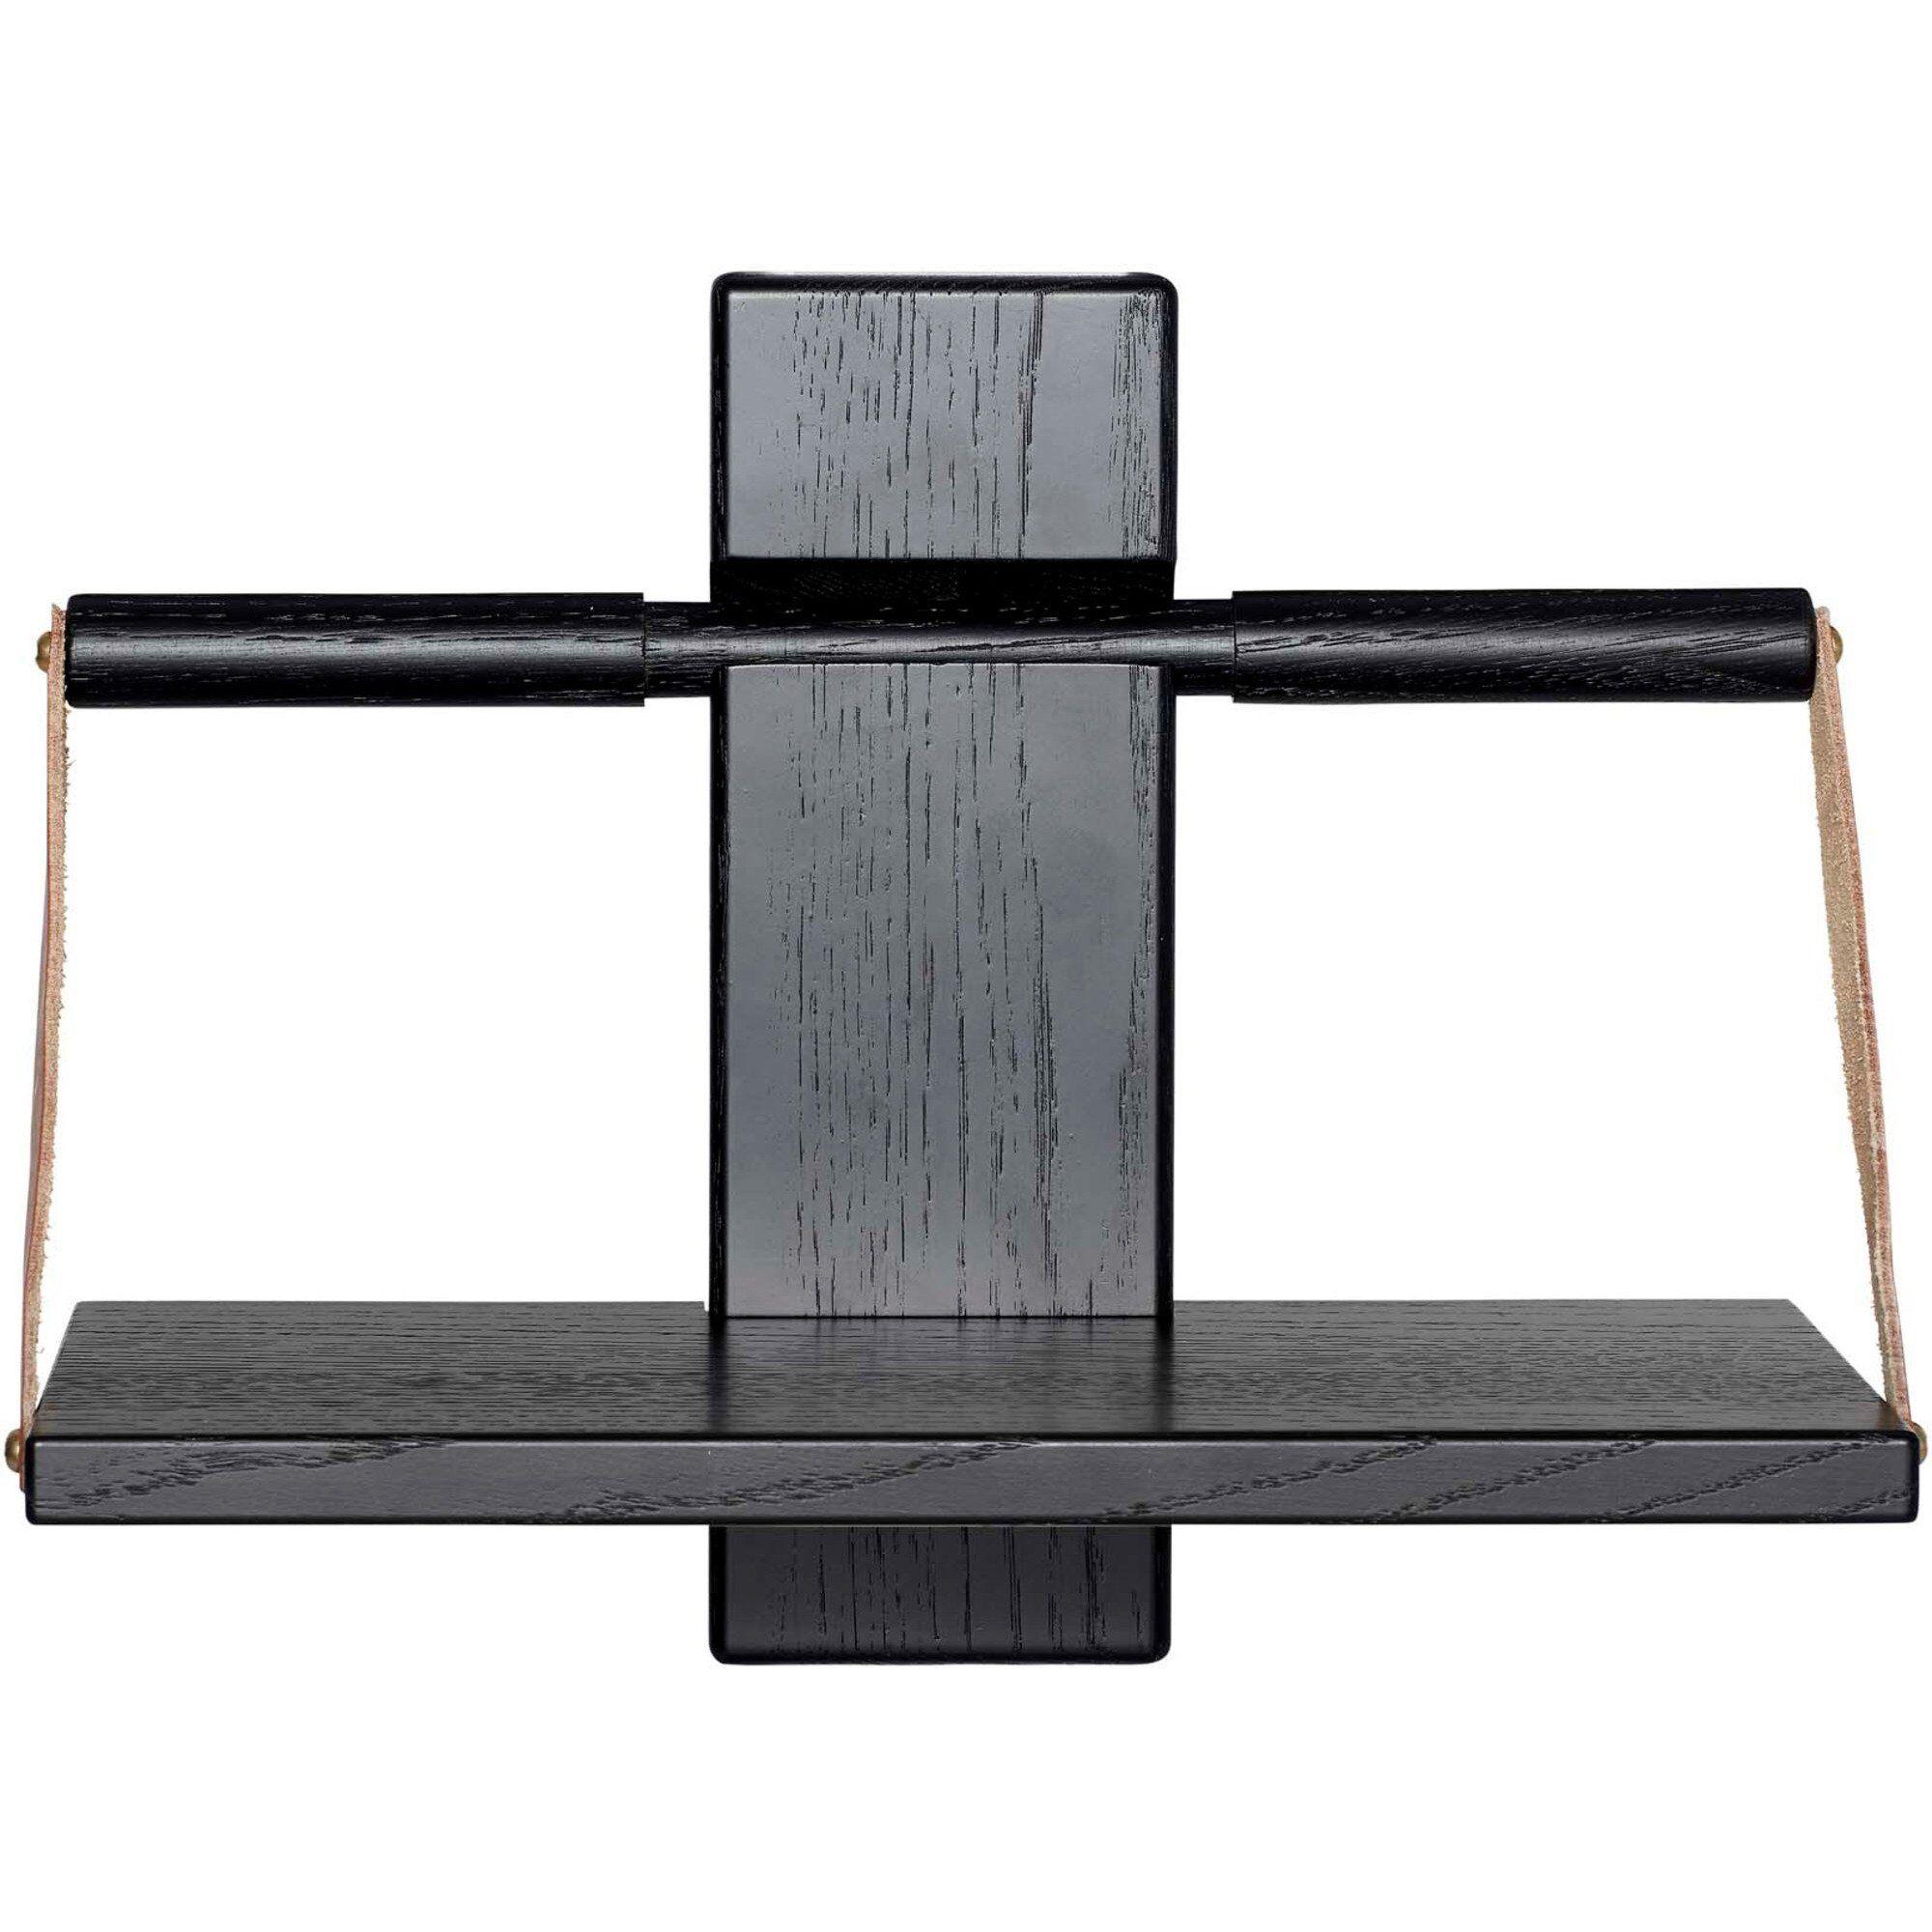 Andersen Furniture Wood wall Shelf 30 x 18 x 24 cm Liten Black